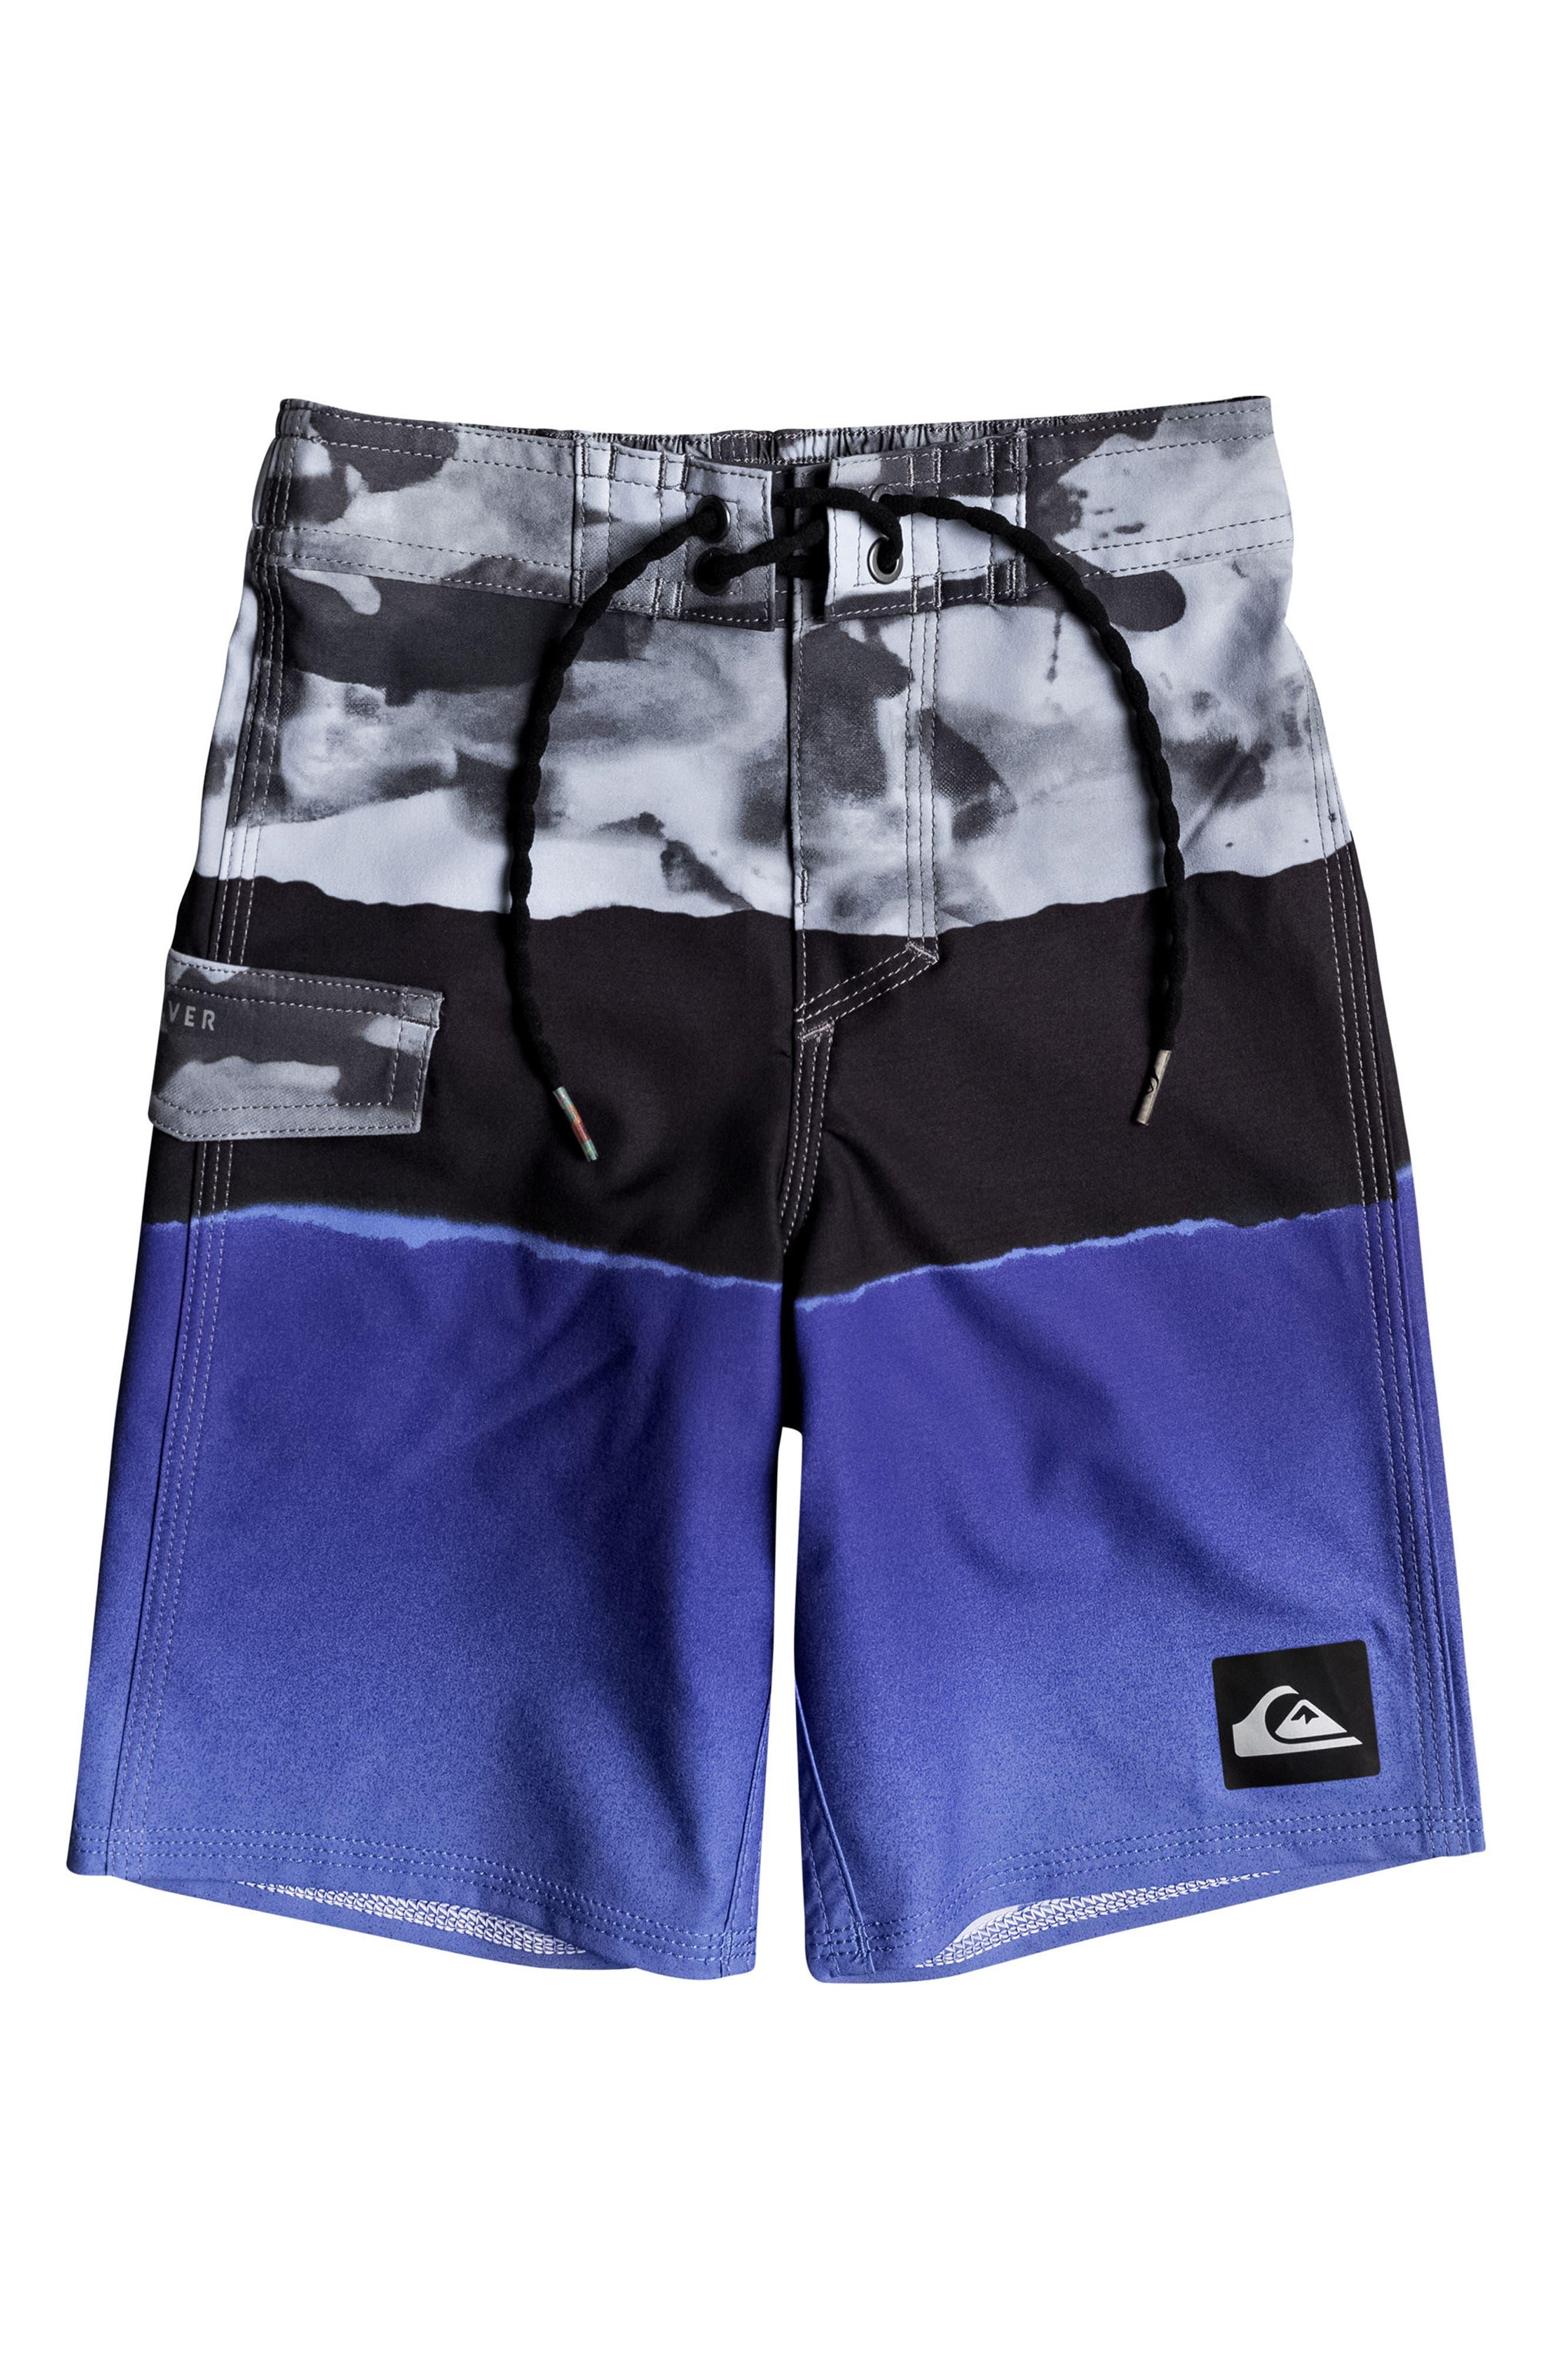 QUIKSILVER,                             Blocked Resin Camo Board Shorts,                             Main thumbnail 1, color,                             421